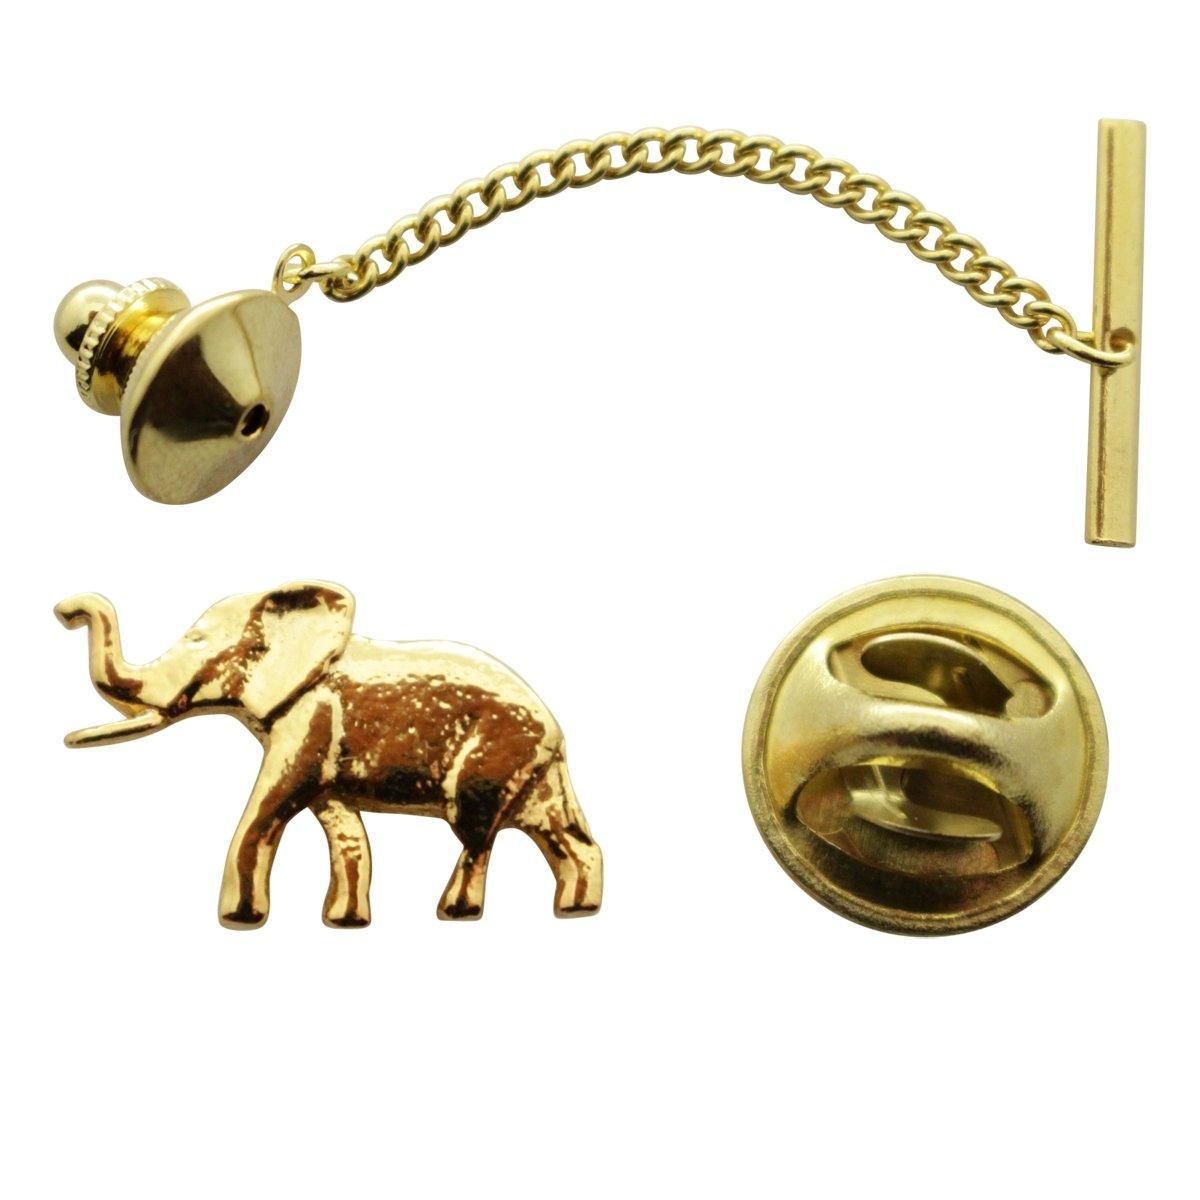 Elephant Tie Tack ~ 24K Gold ~ Tie Tack or Pin ~ Sarah's Treats & Treasures